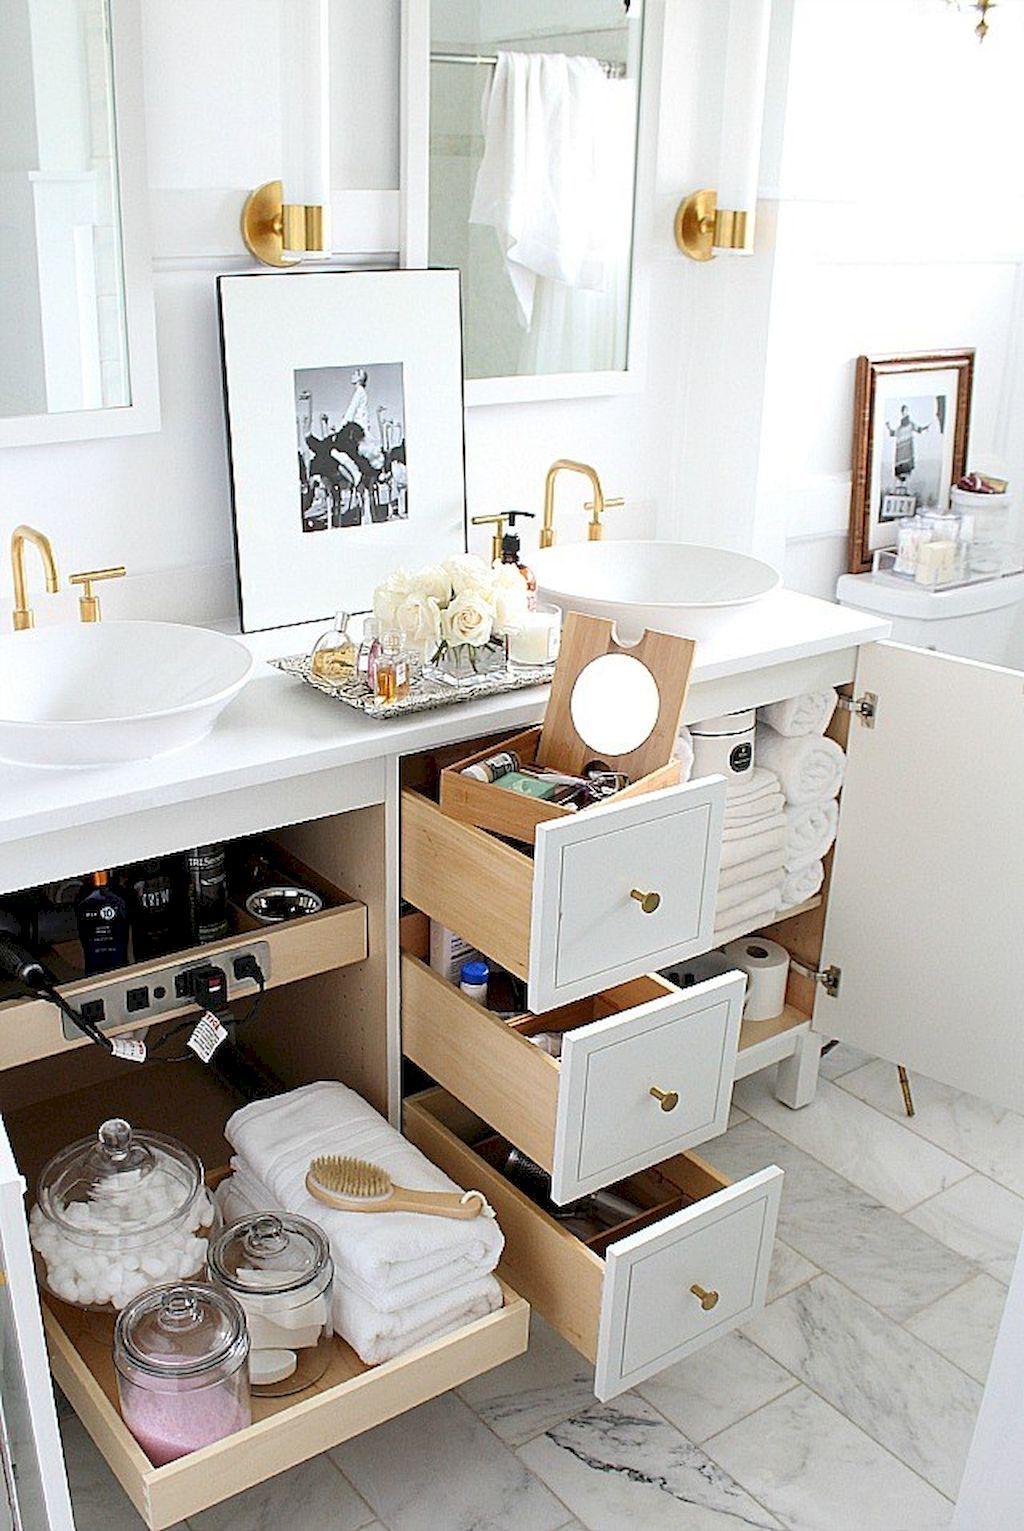 79 Functional Small Bathroom Organization Ideas | Pinterest ...